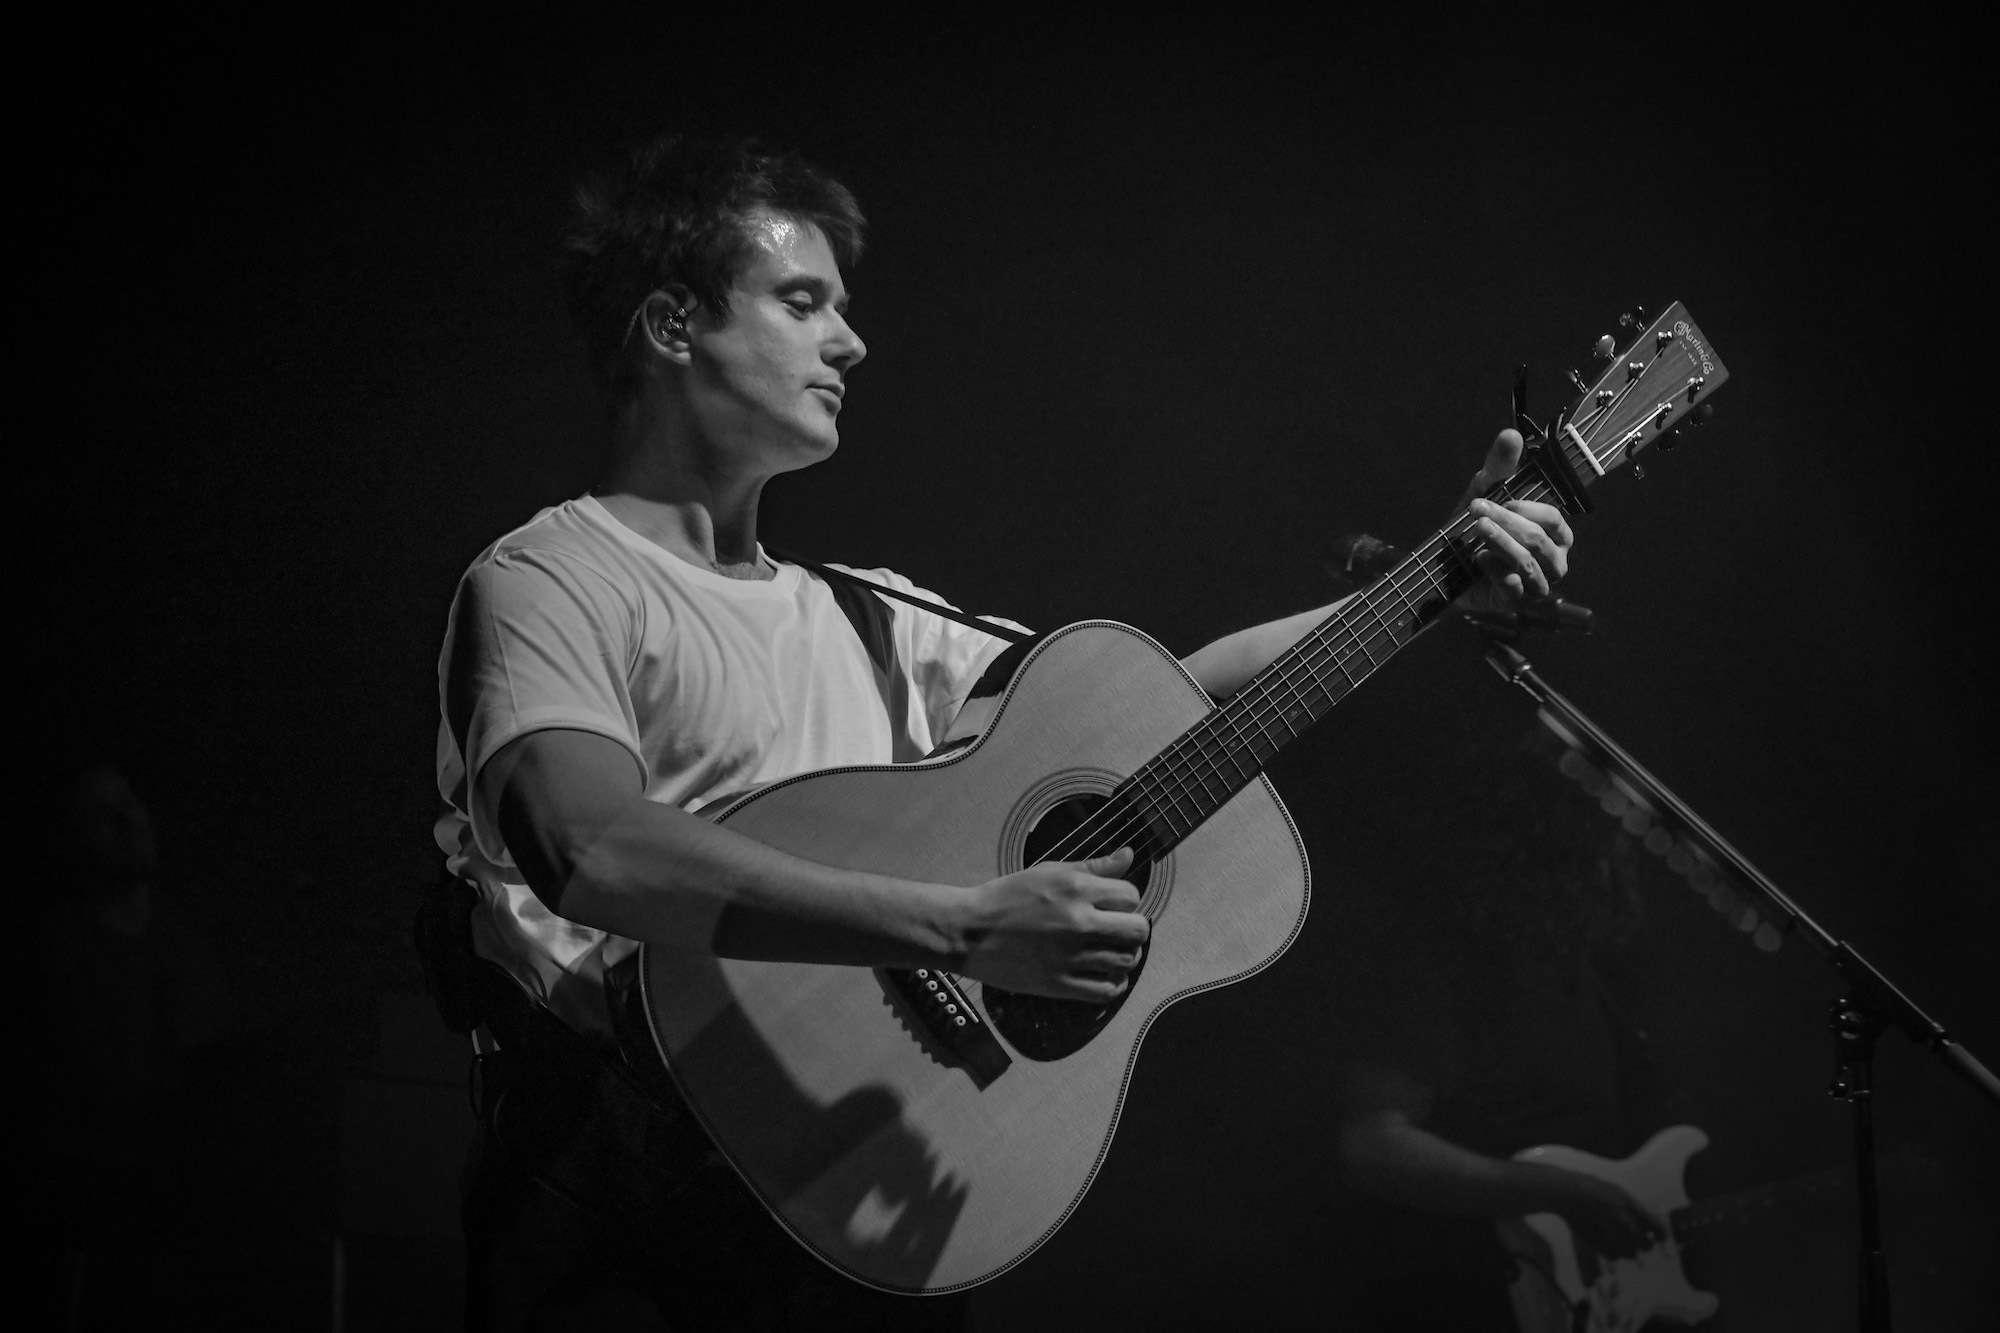 Alec Benjamin Live at Riviera [GALLERY] 12